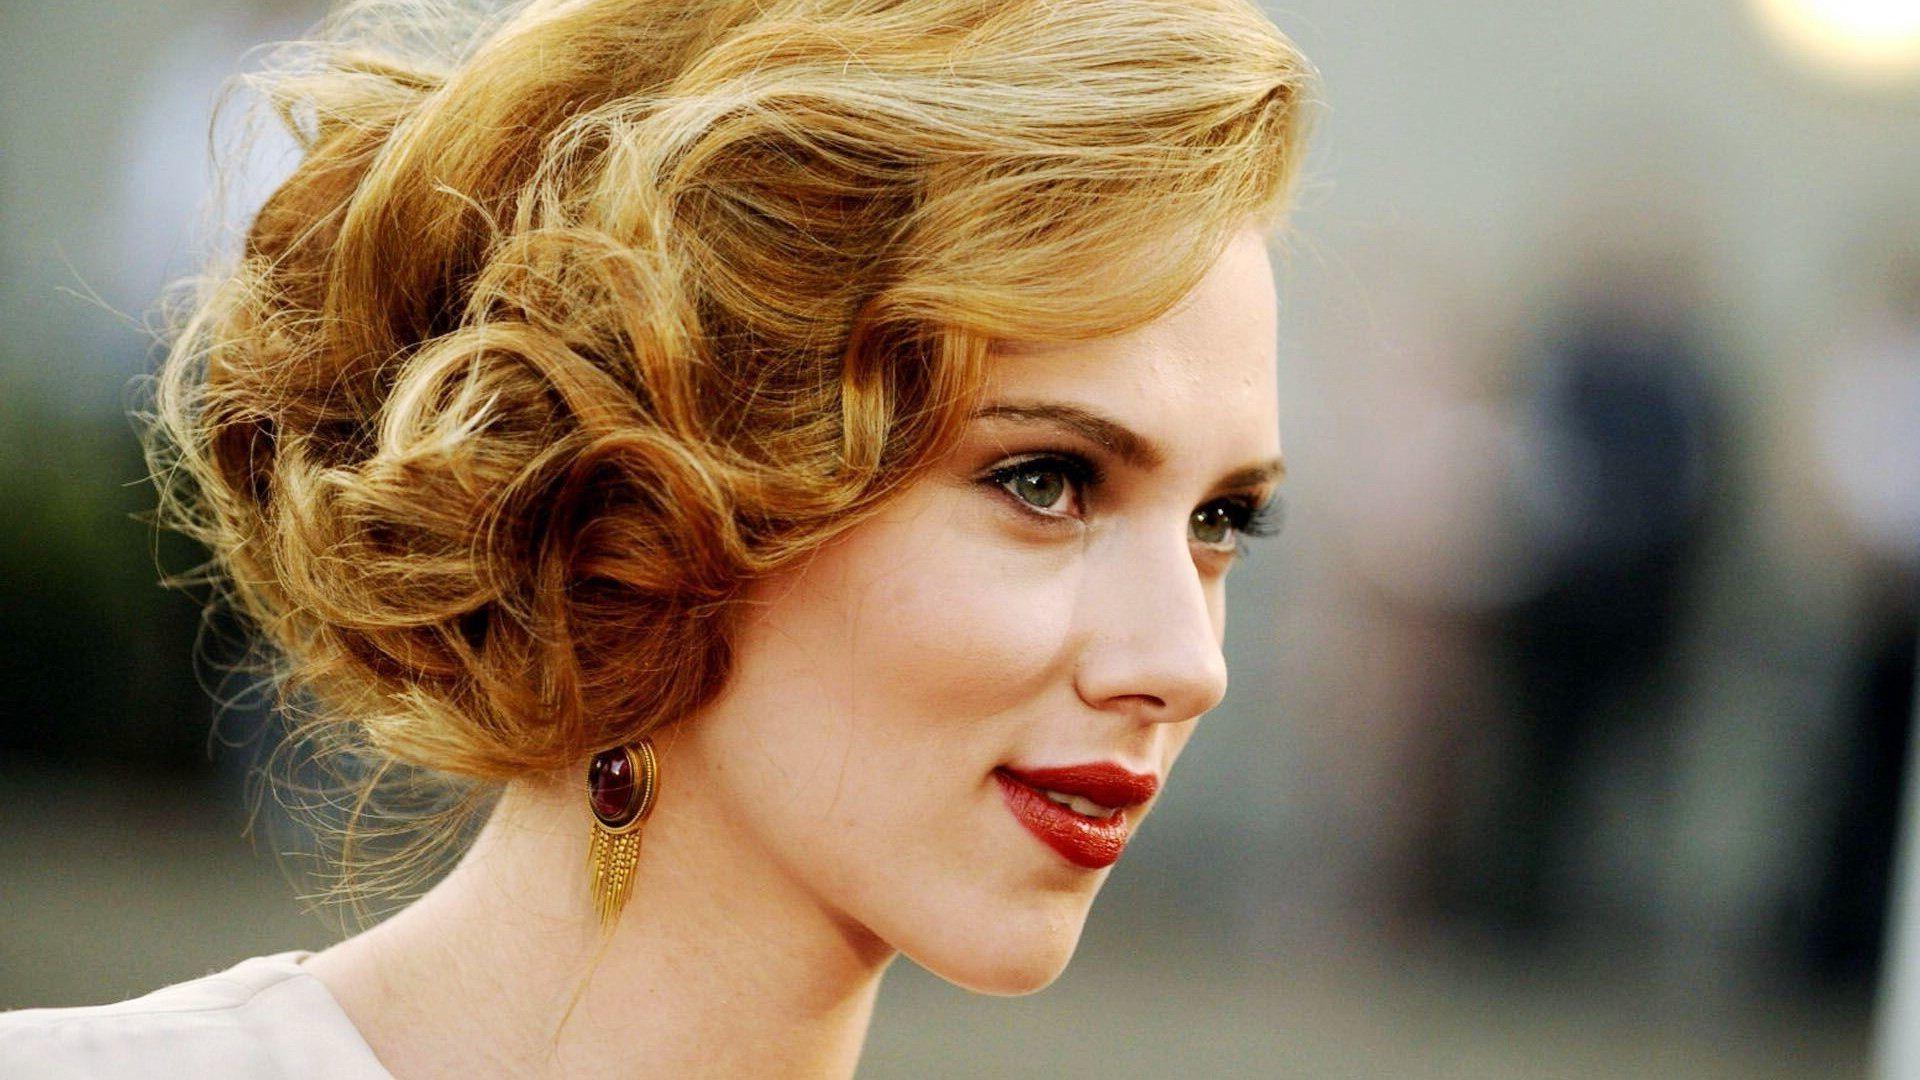 Scarlett johansson hd wallpaper 65 images - Hollywood actress full hd wallpaper ...